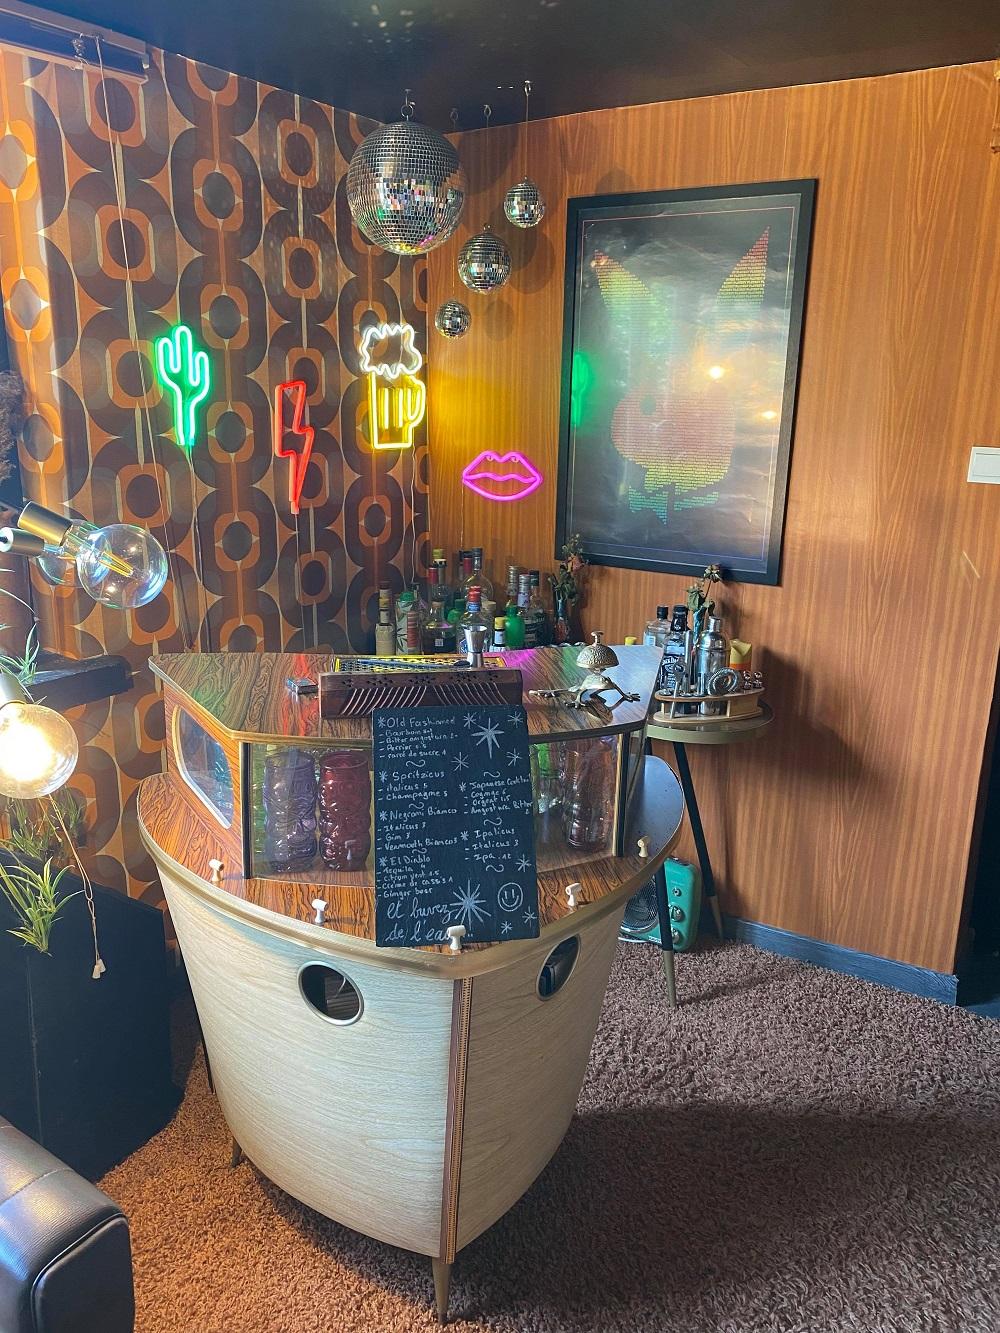 Vincent - Gameroom ambiance 70s